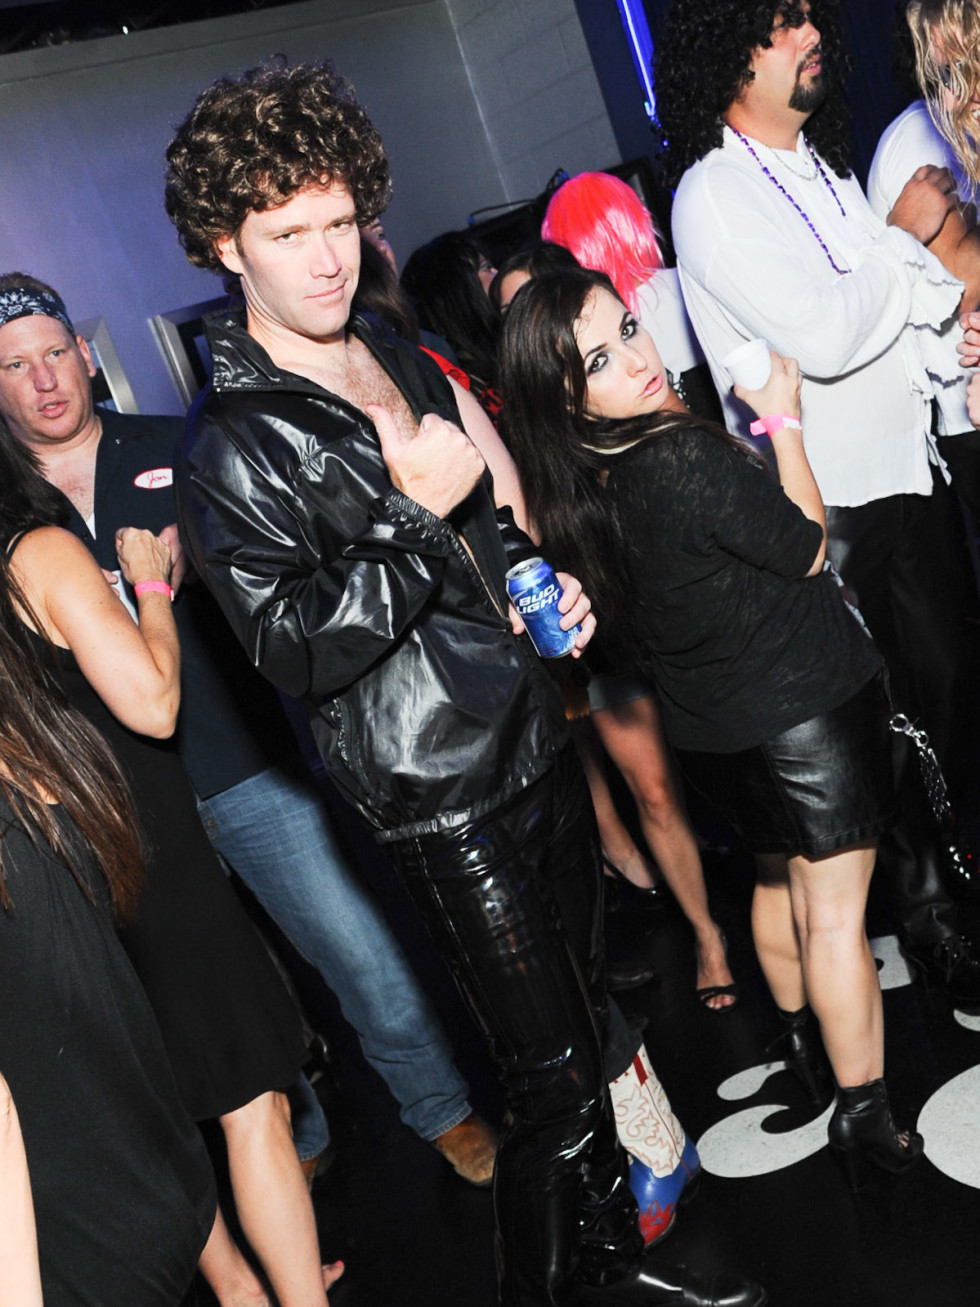 News_Party Like a Rock Star_Mike Maggart_Shiva Rafferty